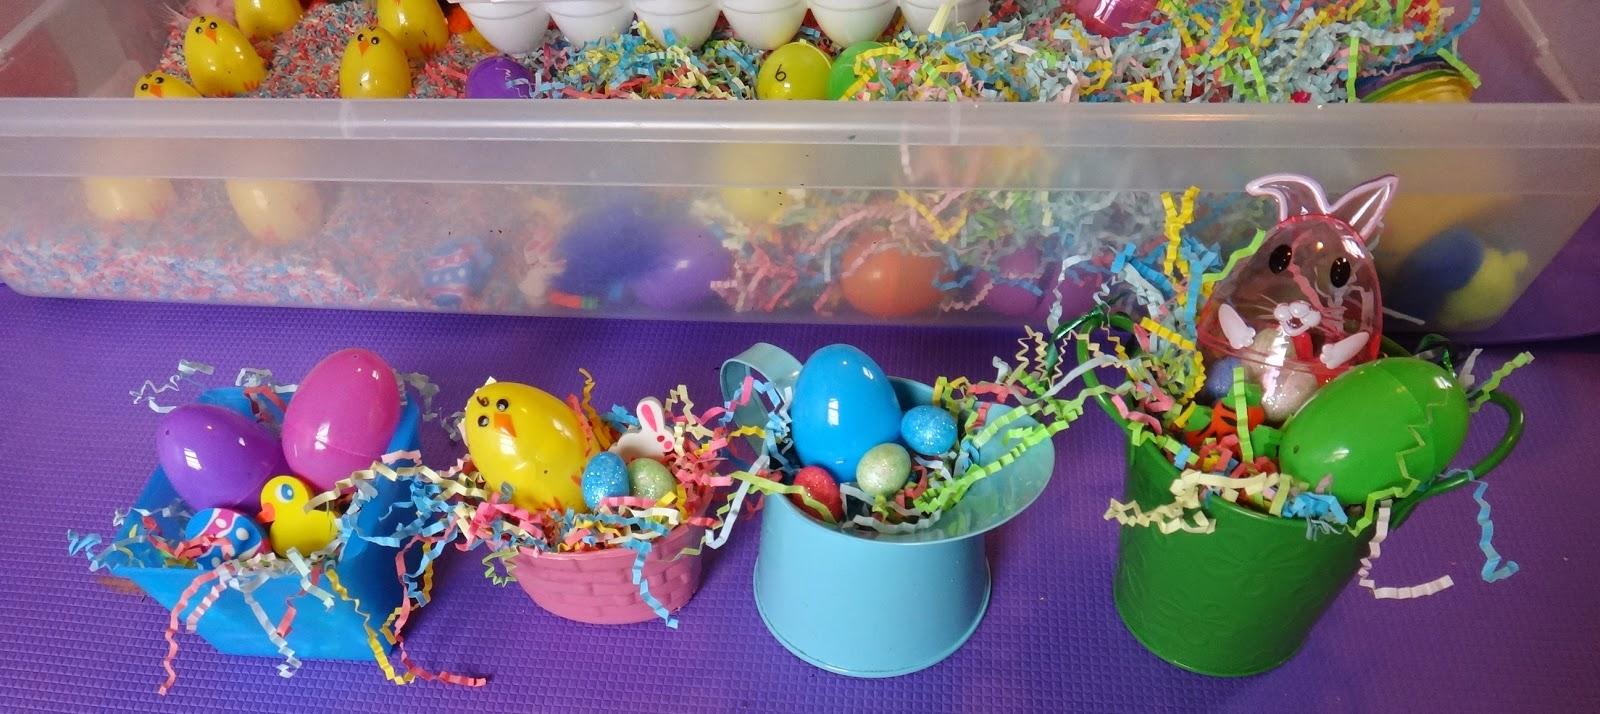 Easter sensory bin making Easter baskets